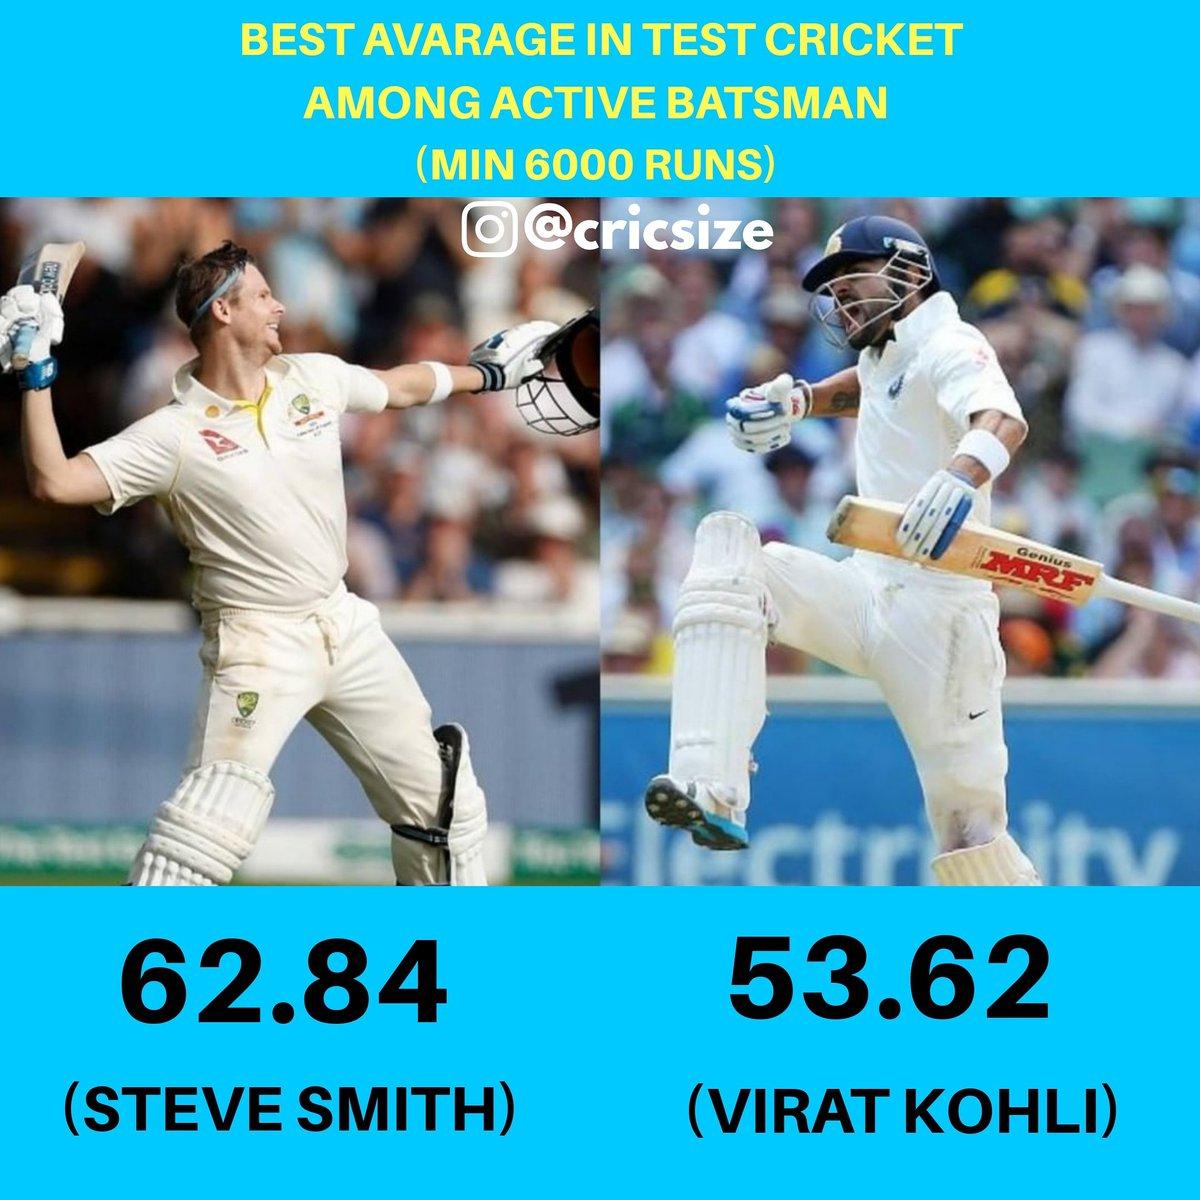 Steve Smith has the best Test average among active batsmen. . . #SteveSmith #ViratKohli #Test #Average #Cricket #Batsman #australiacricketteam #indiancricketteam #cricketlife #cricketworldcup #cricketvideos #cricketupdates #cricketlove #cricsize https://t.co/wdskeRnd0M